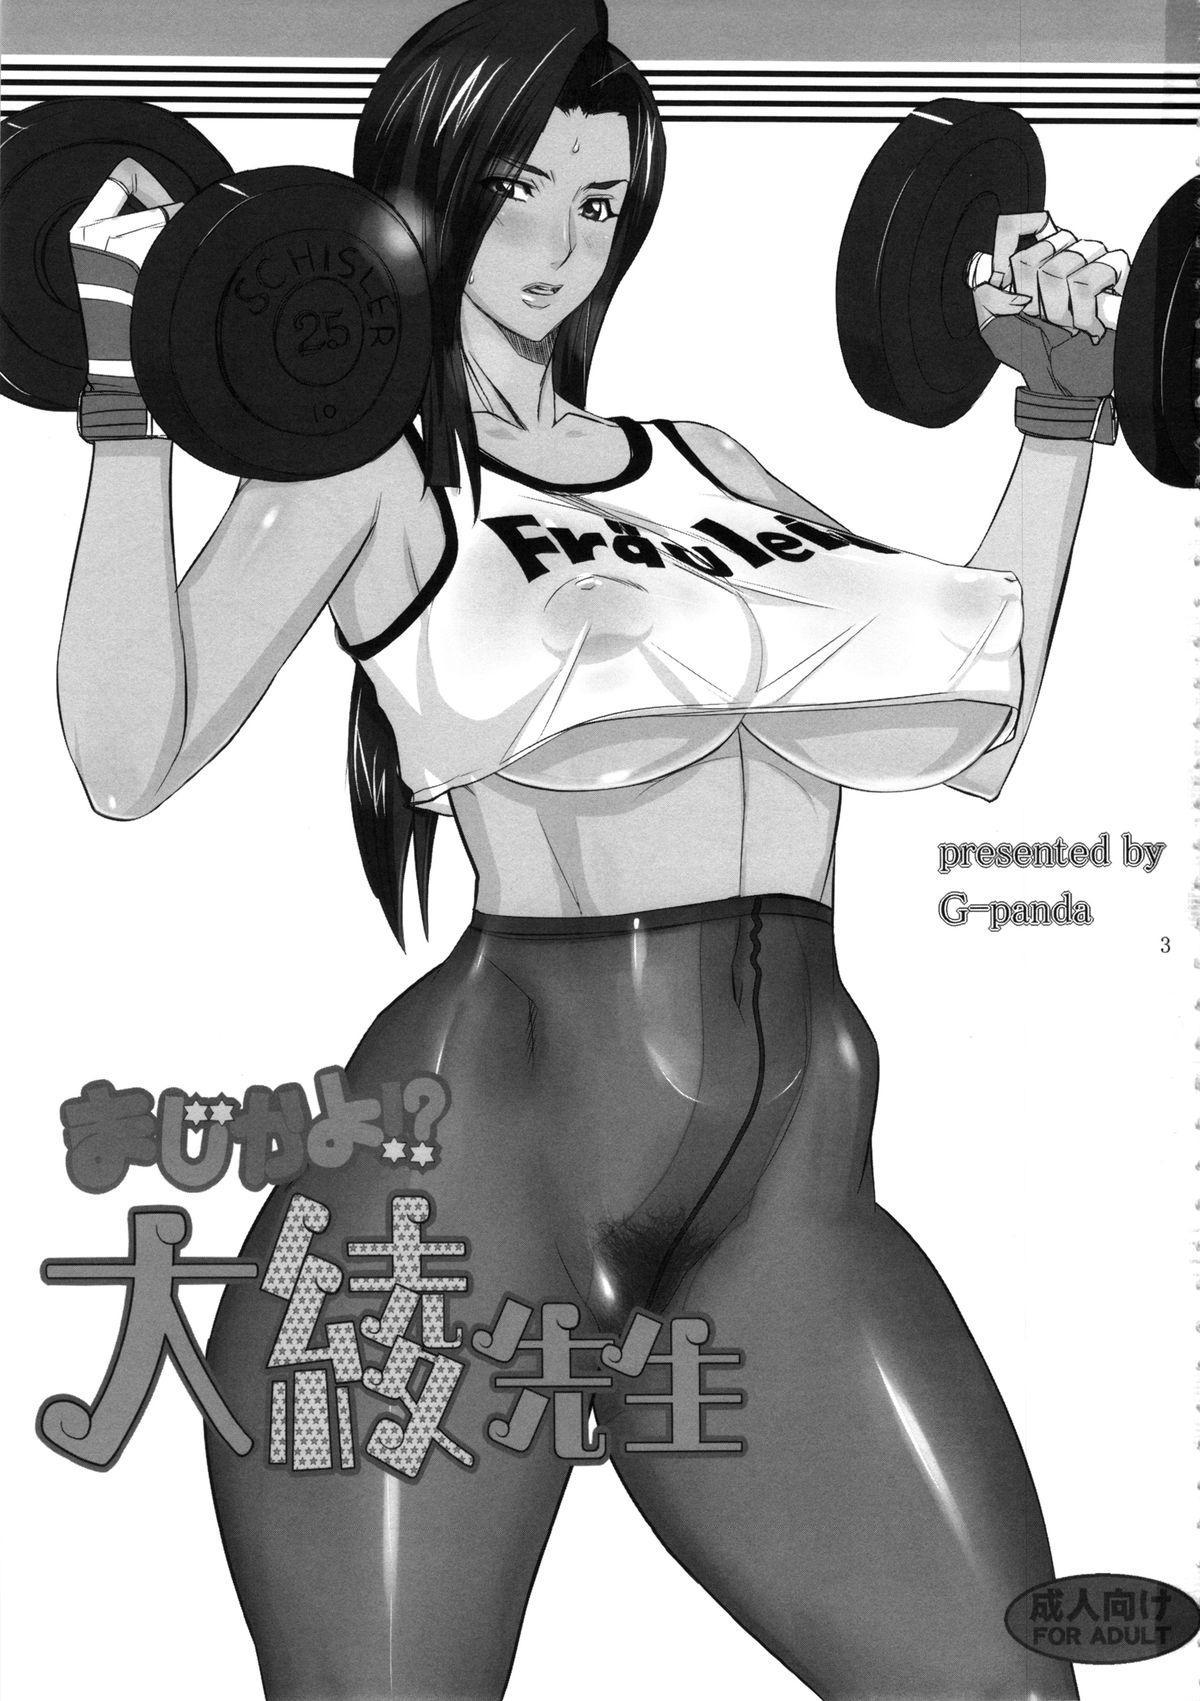 (COMIC1☆8) [G-panda (Midoh Tsukasa)] Maji kayo!? Ooaya-sensei   I Can't Believe It! Ooaya-sensei (Magical Taruruuto-kun) [English] {doujin-moe.us} 1